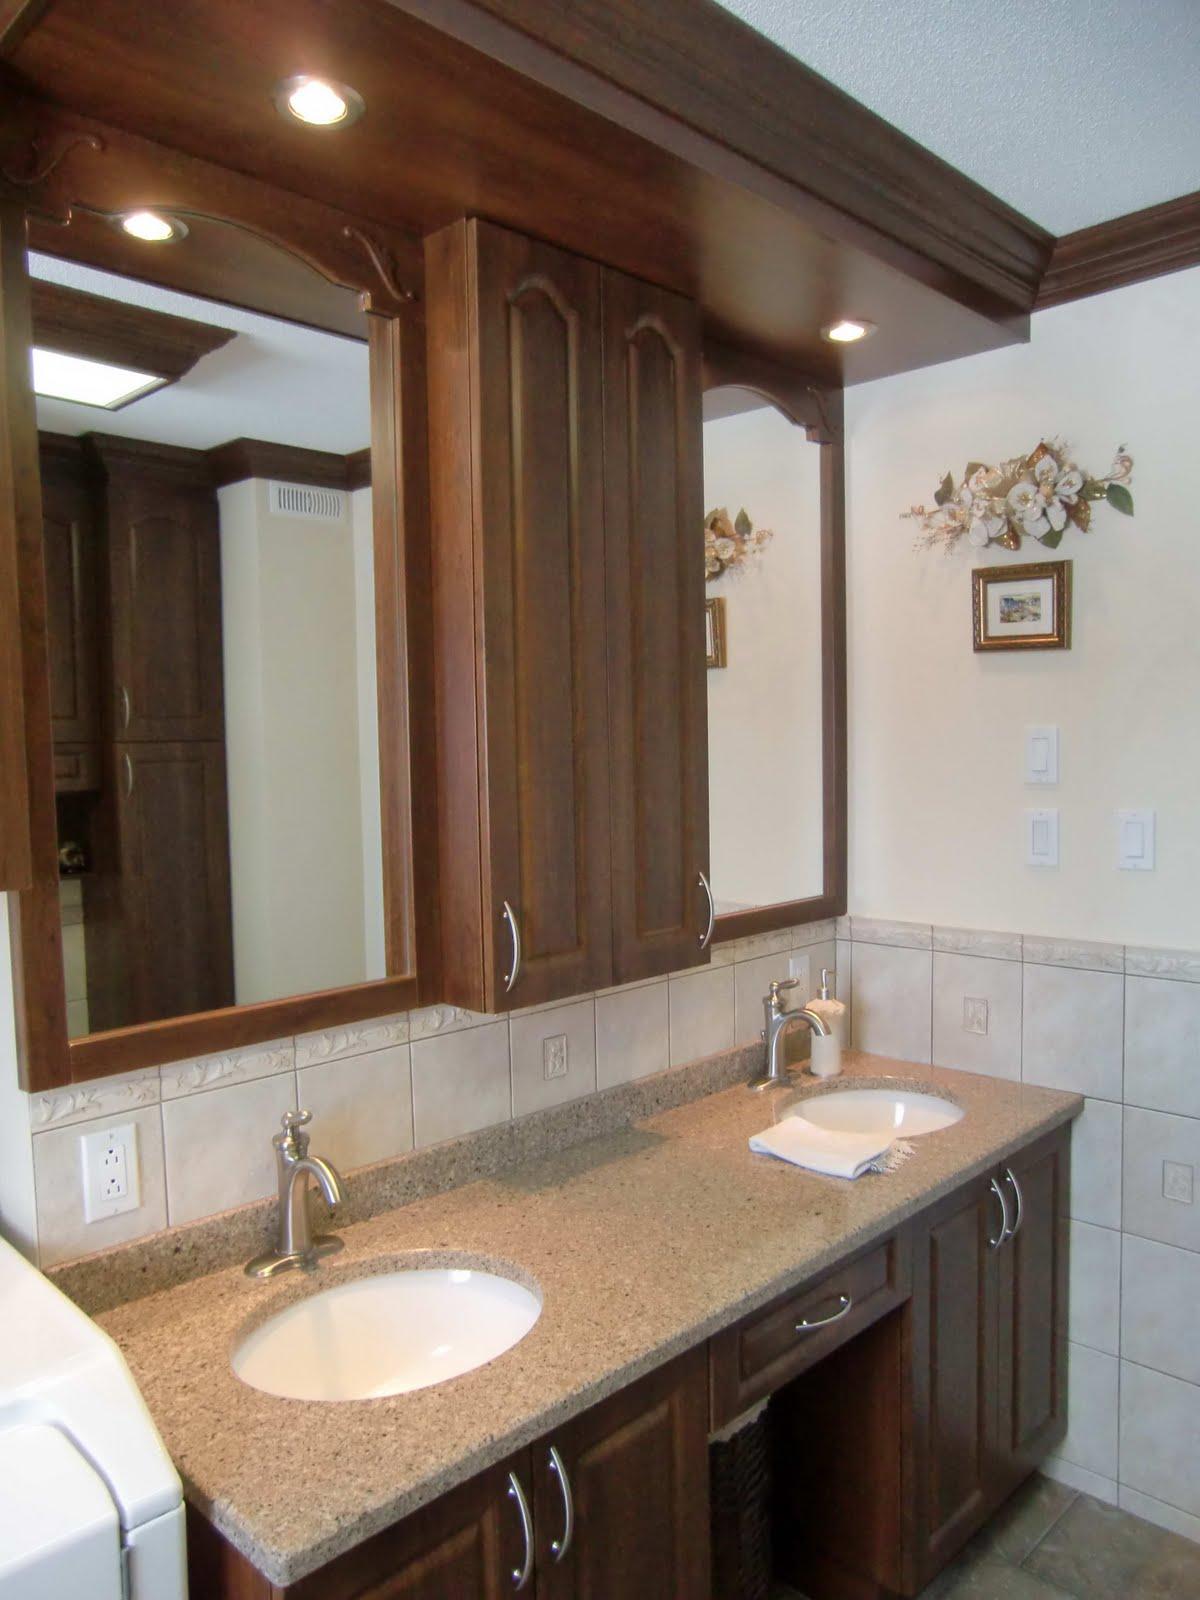 Specialit smm armoire de salle de bain en thermoplastique - Mitigeur thermostatique salle de bain ...